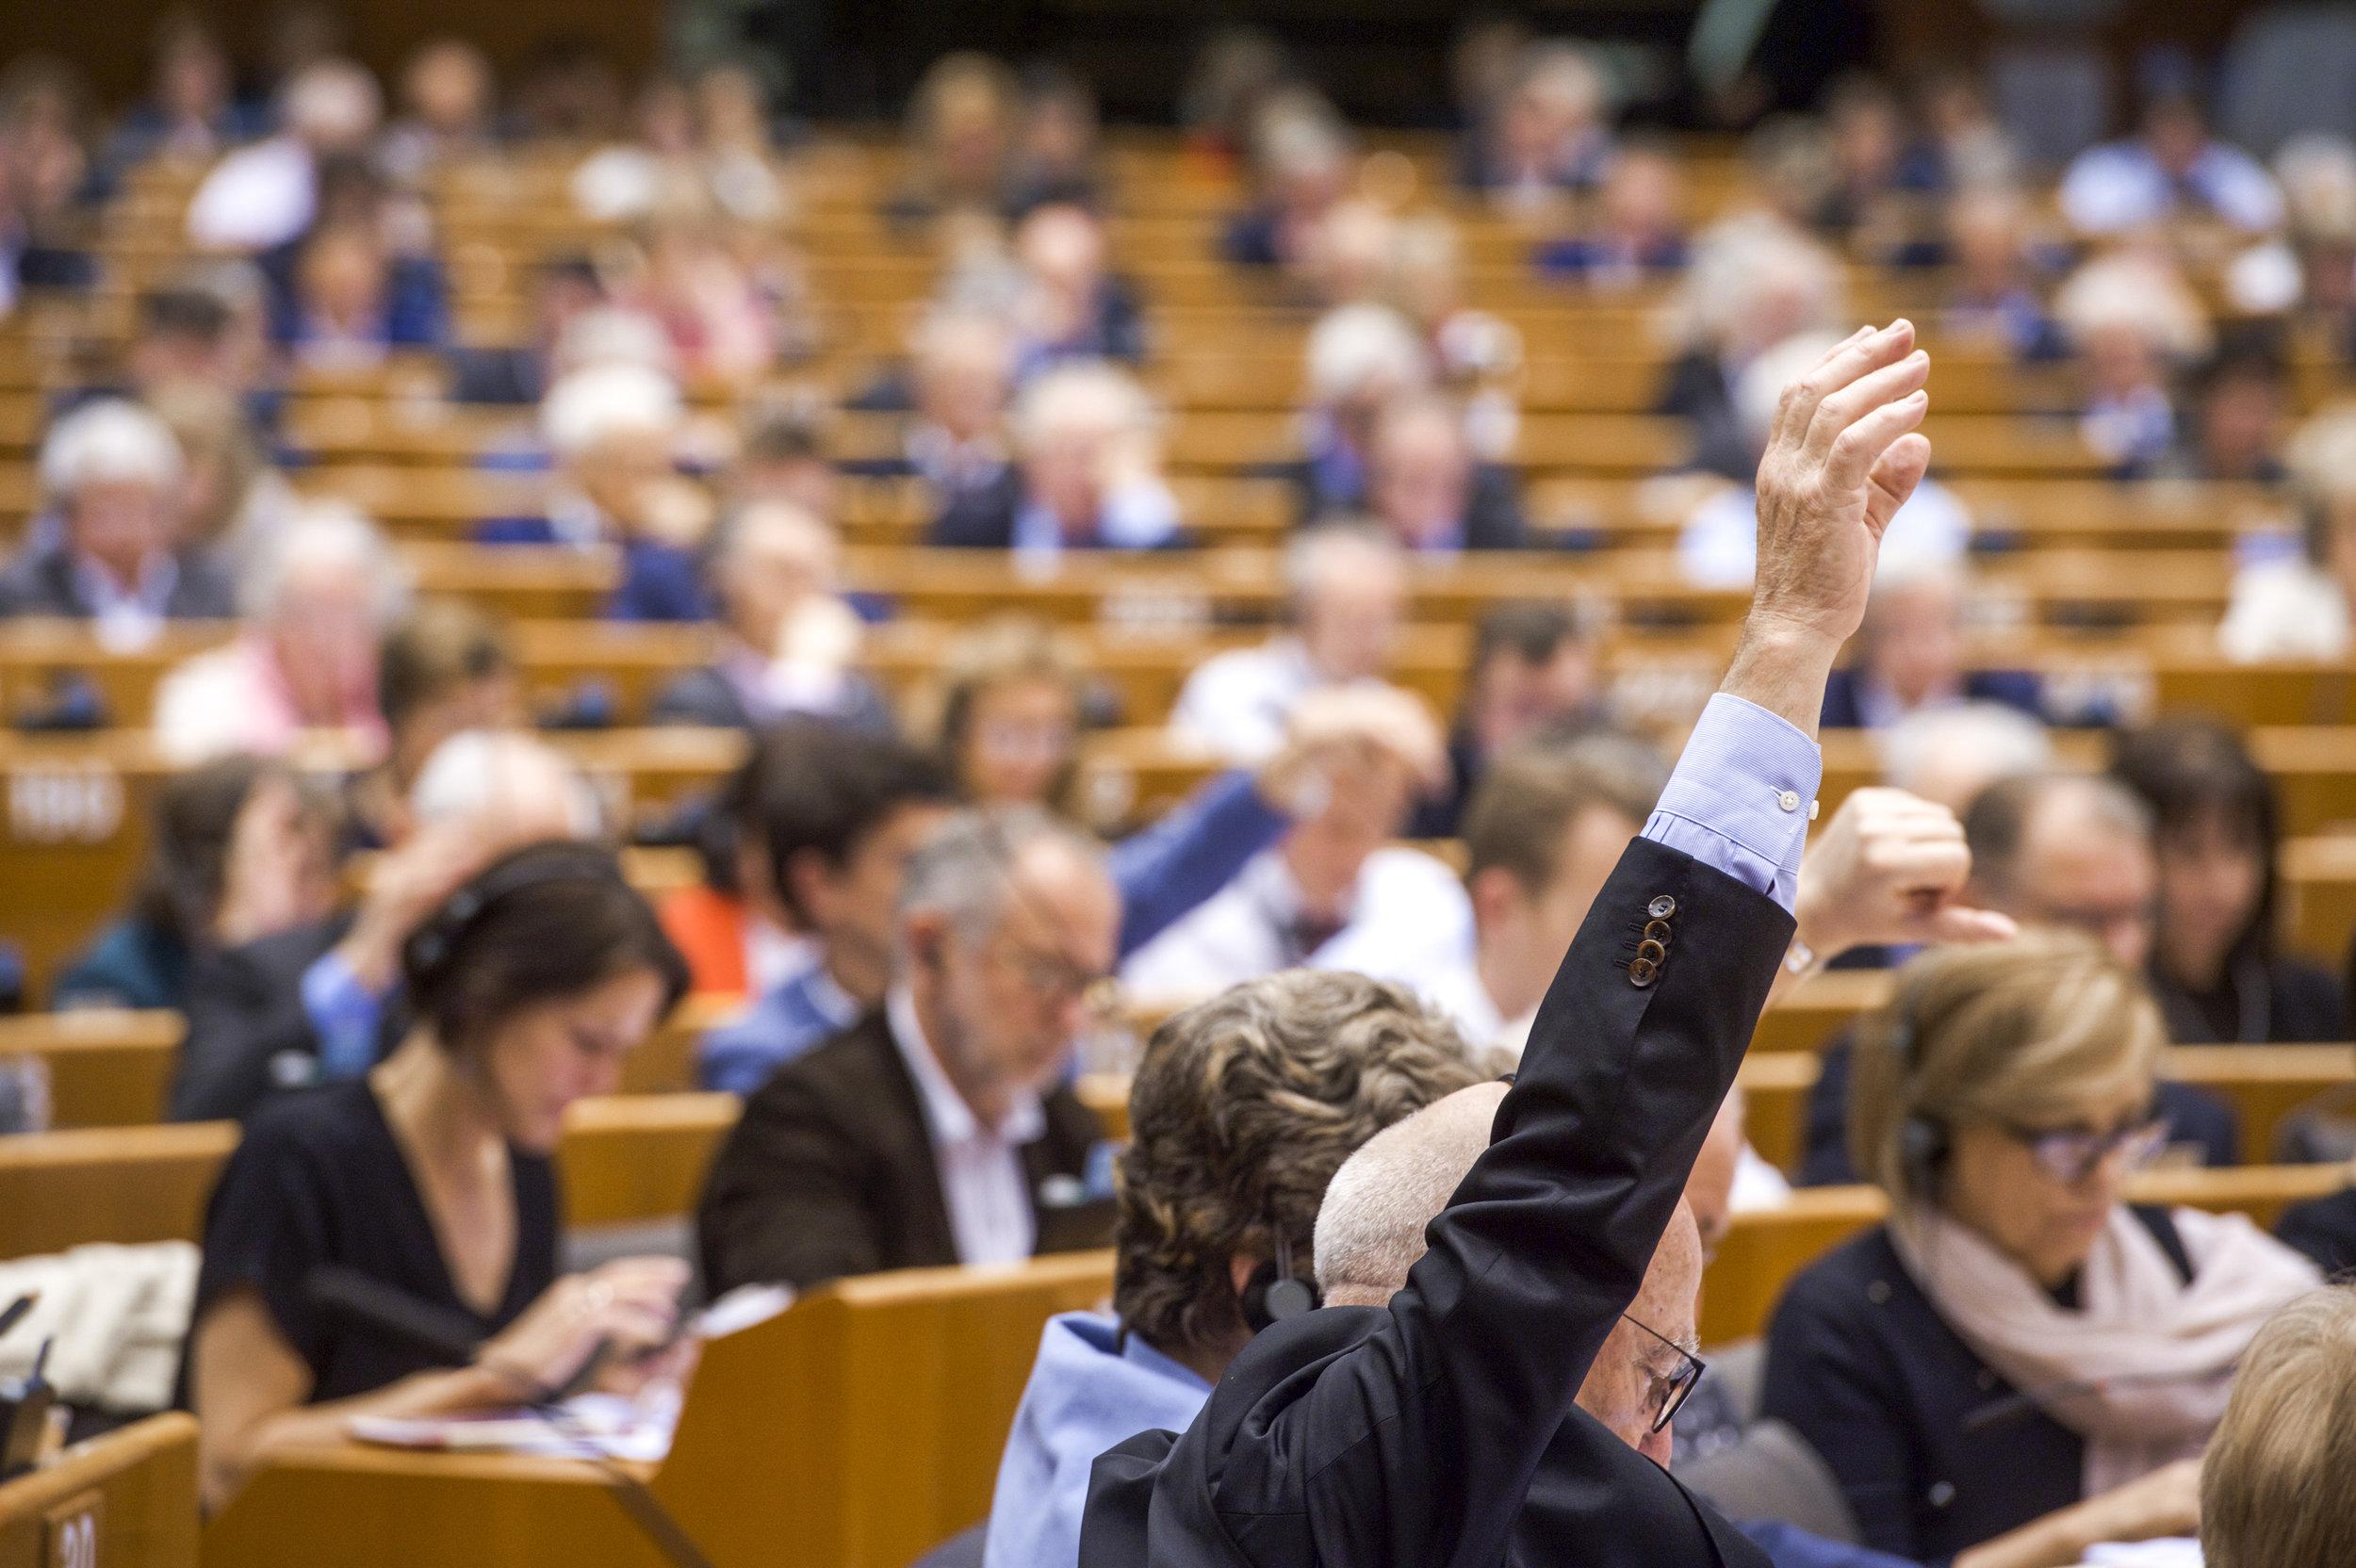 Plenarno zasedanje EU parlamenta. Foto: Jan Van De Vel © European Union 2019 - Source : EP